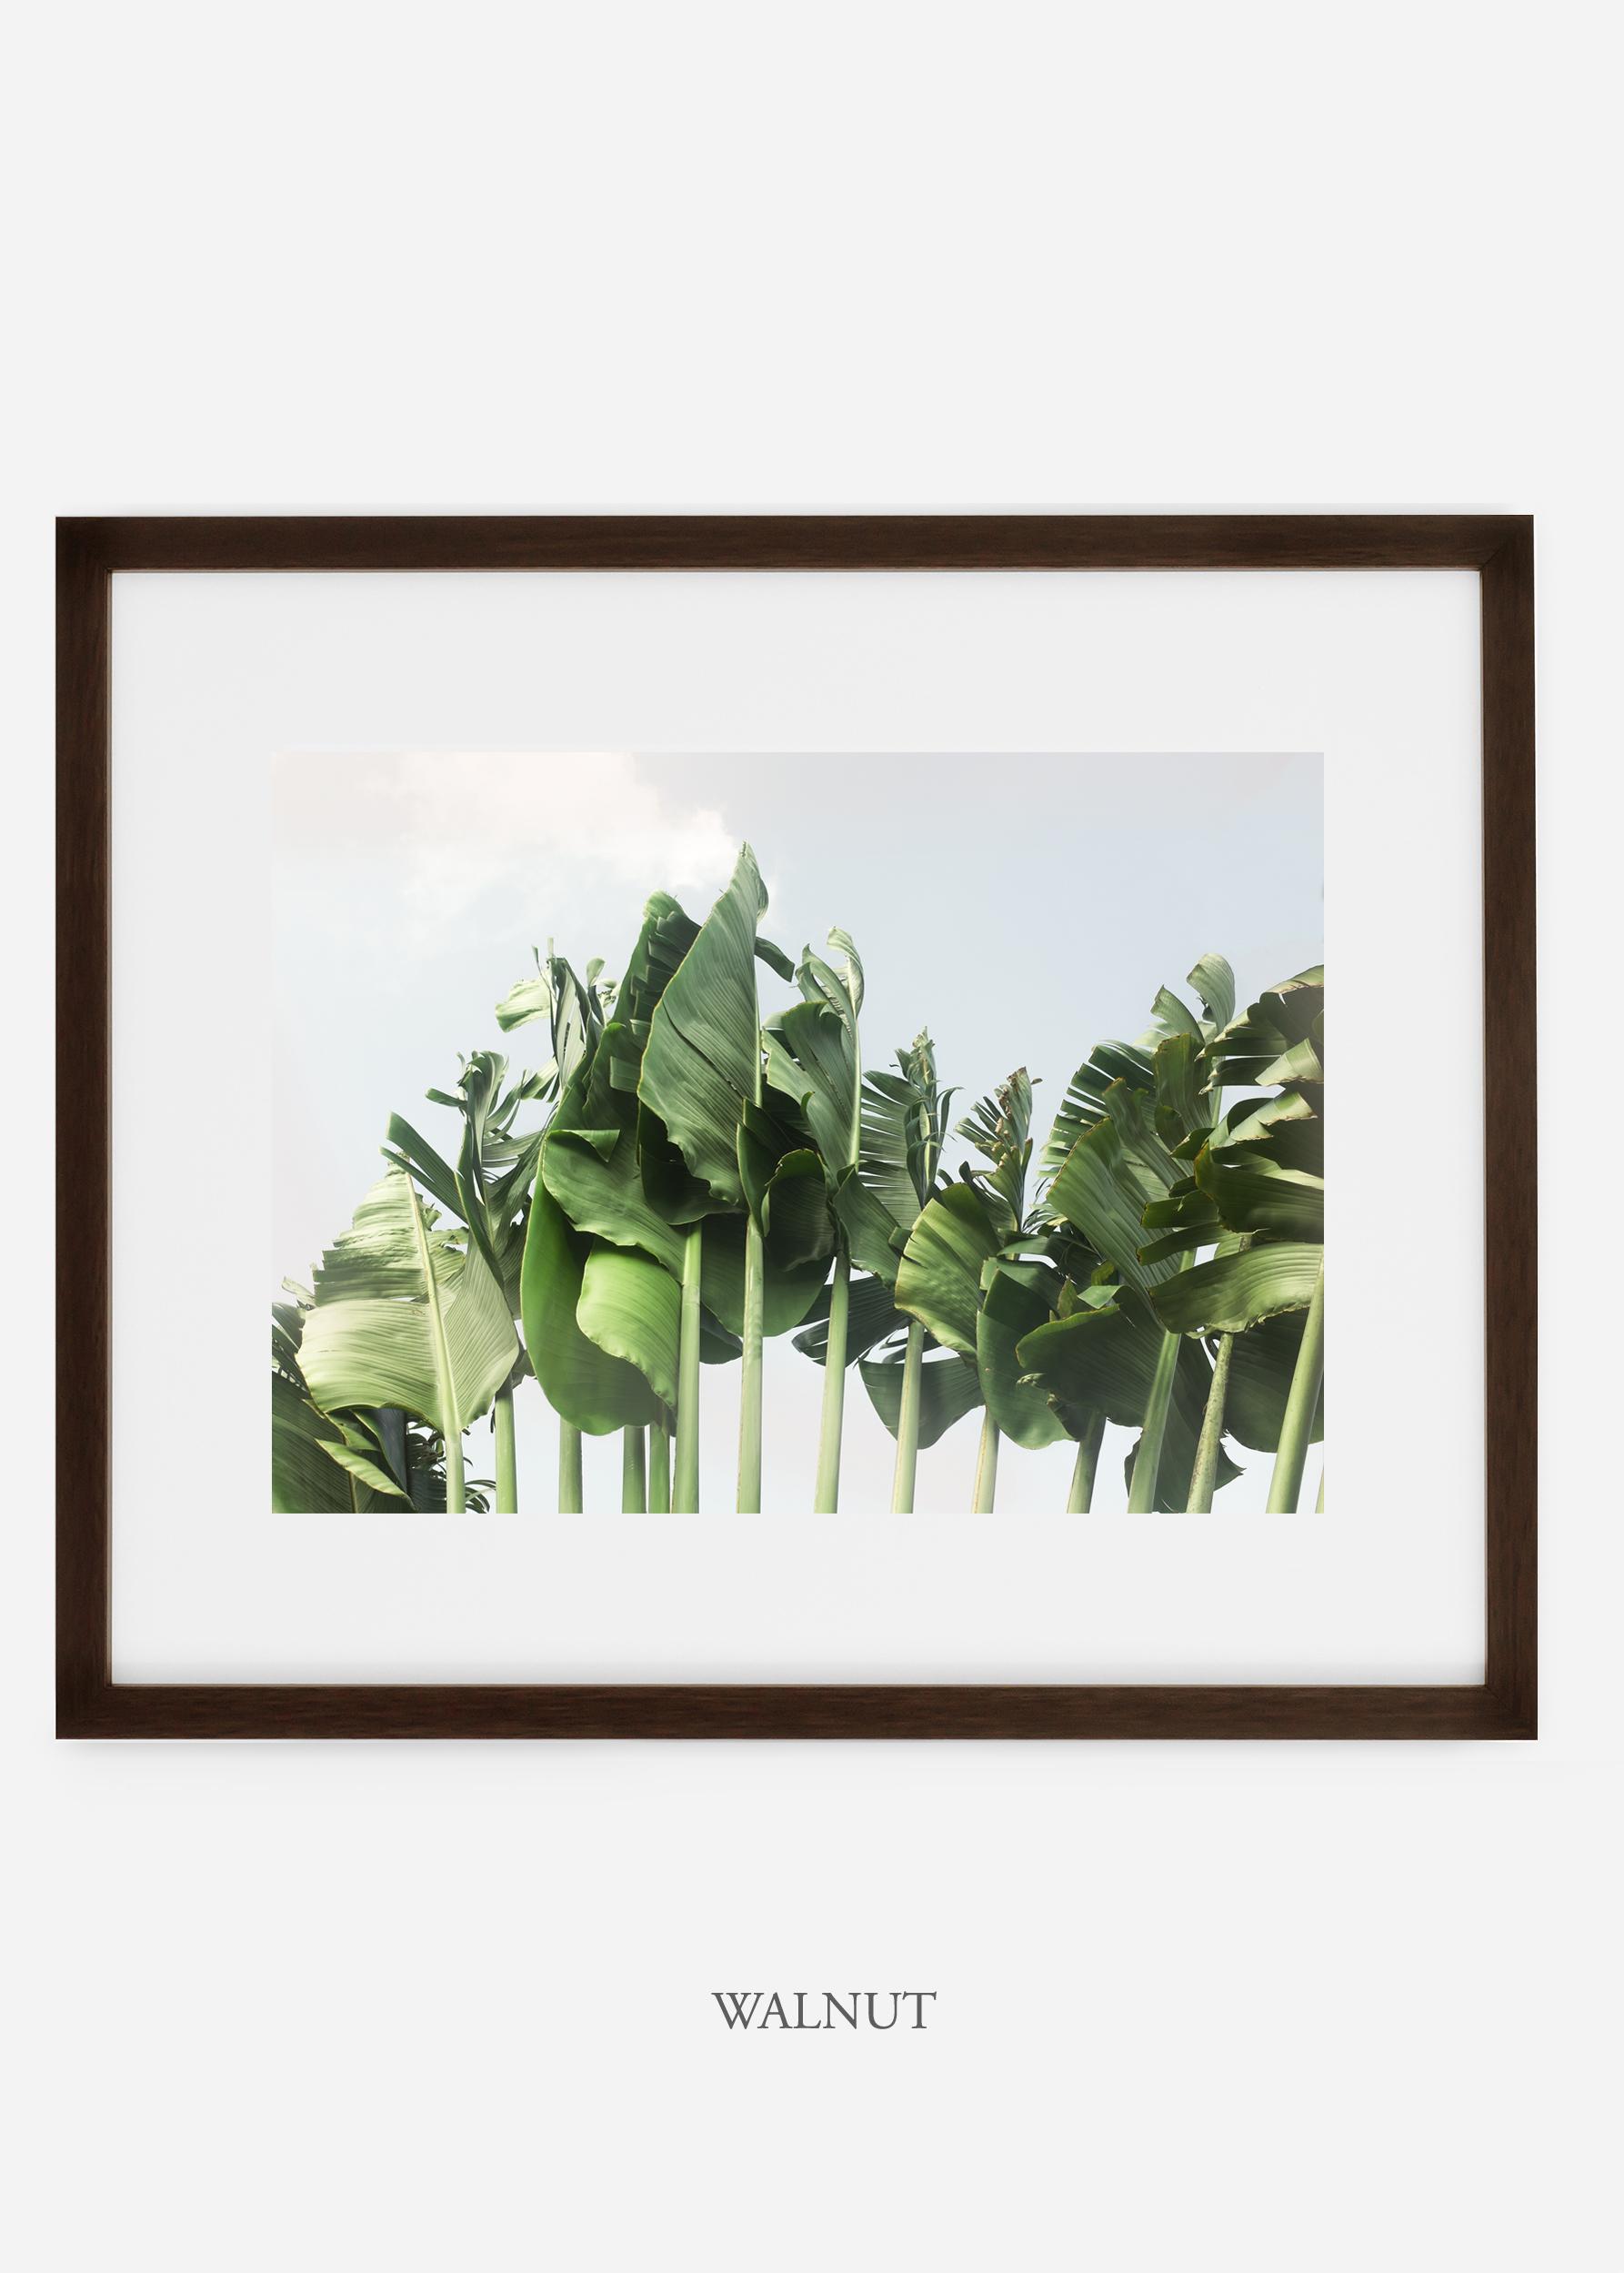 wildercalifornia_walnutframe_tulum_bananaleaf_No.1_minimal_cactus_art_interiordesign_blackandwhite.jpg